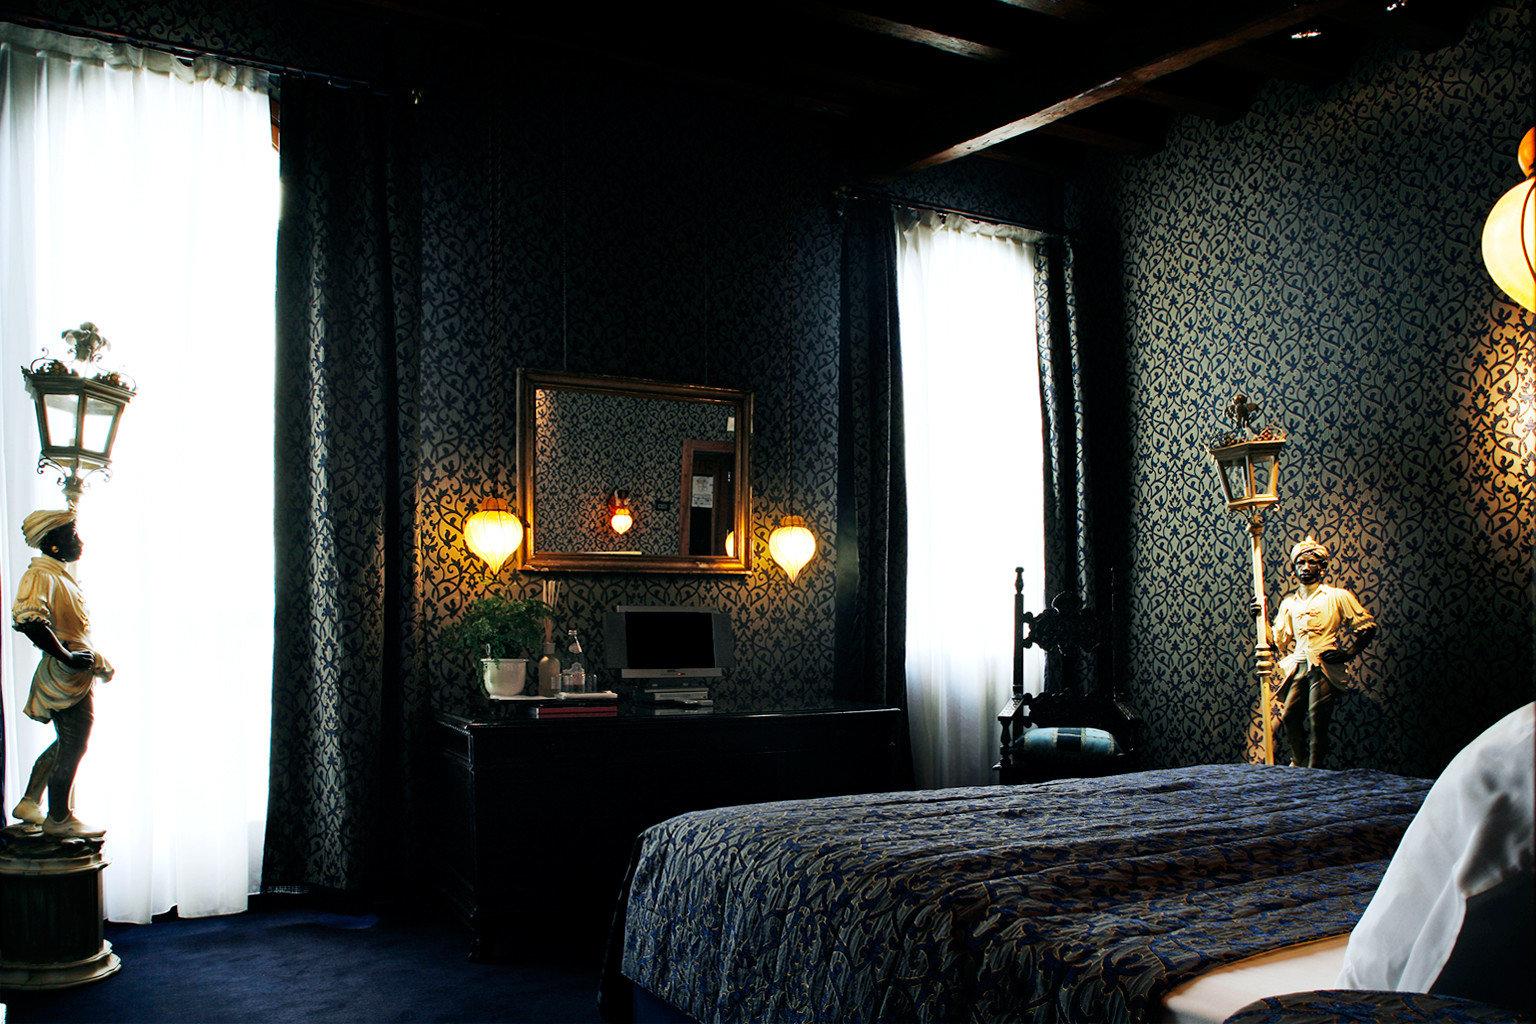 Bedroom Classic Elegant Romance Romantic lighting home living room light lamp